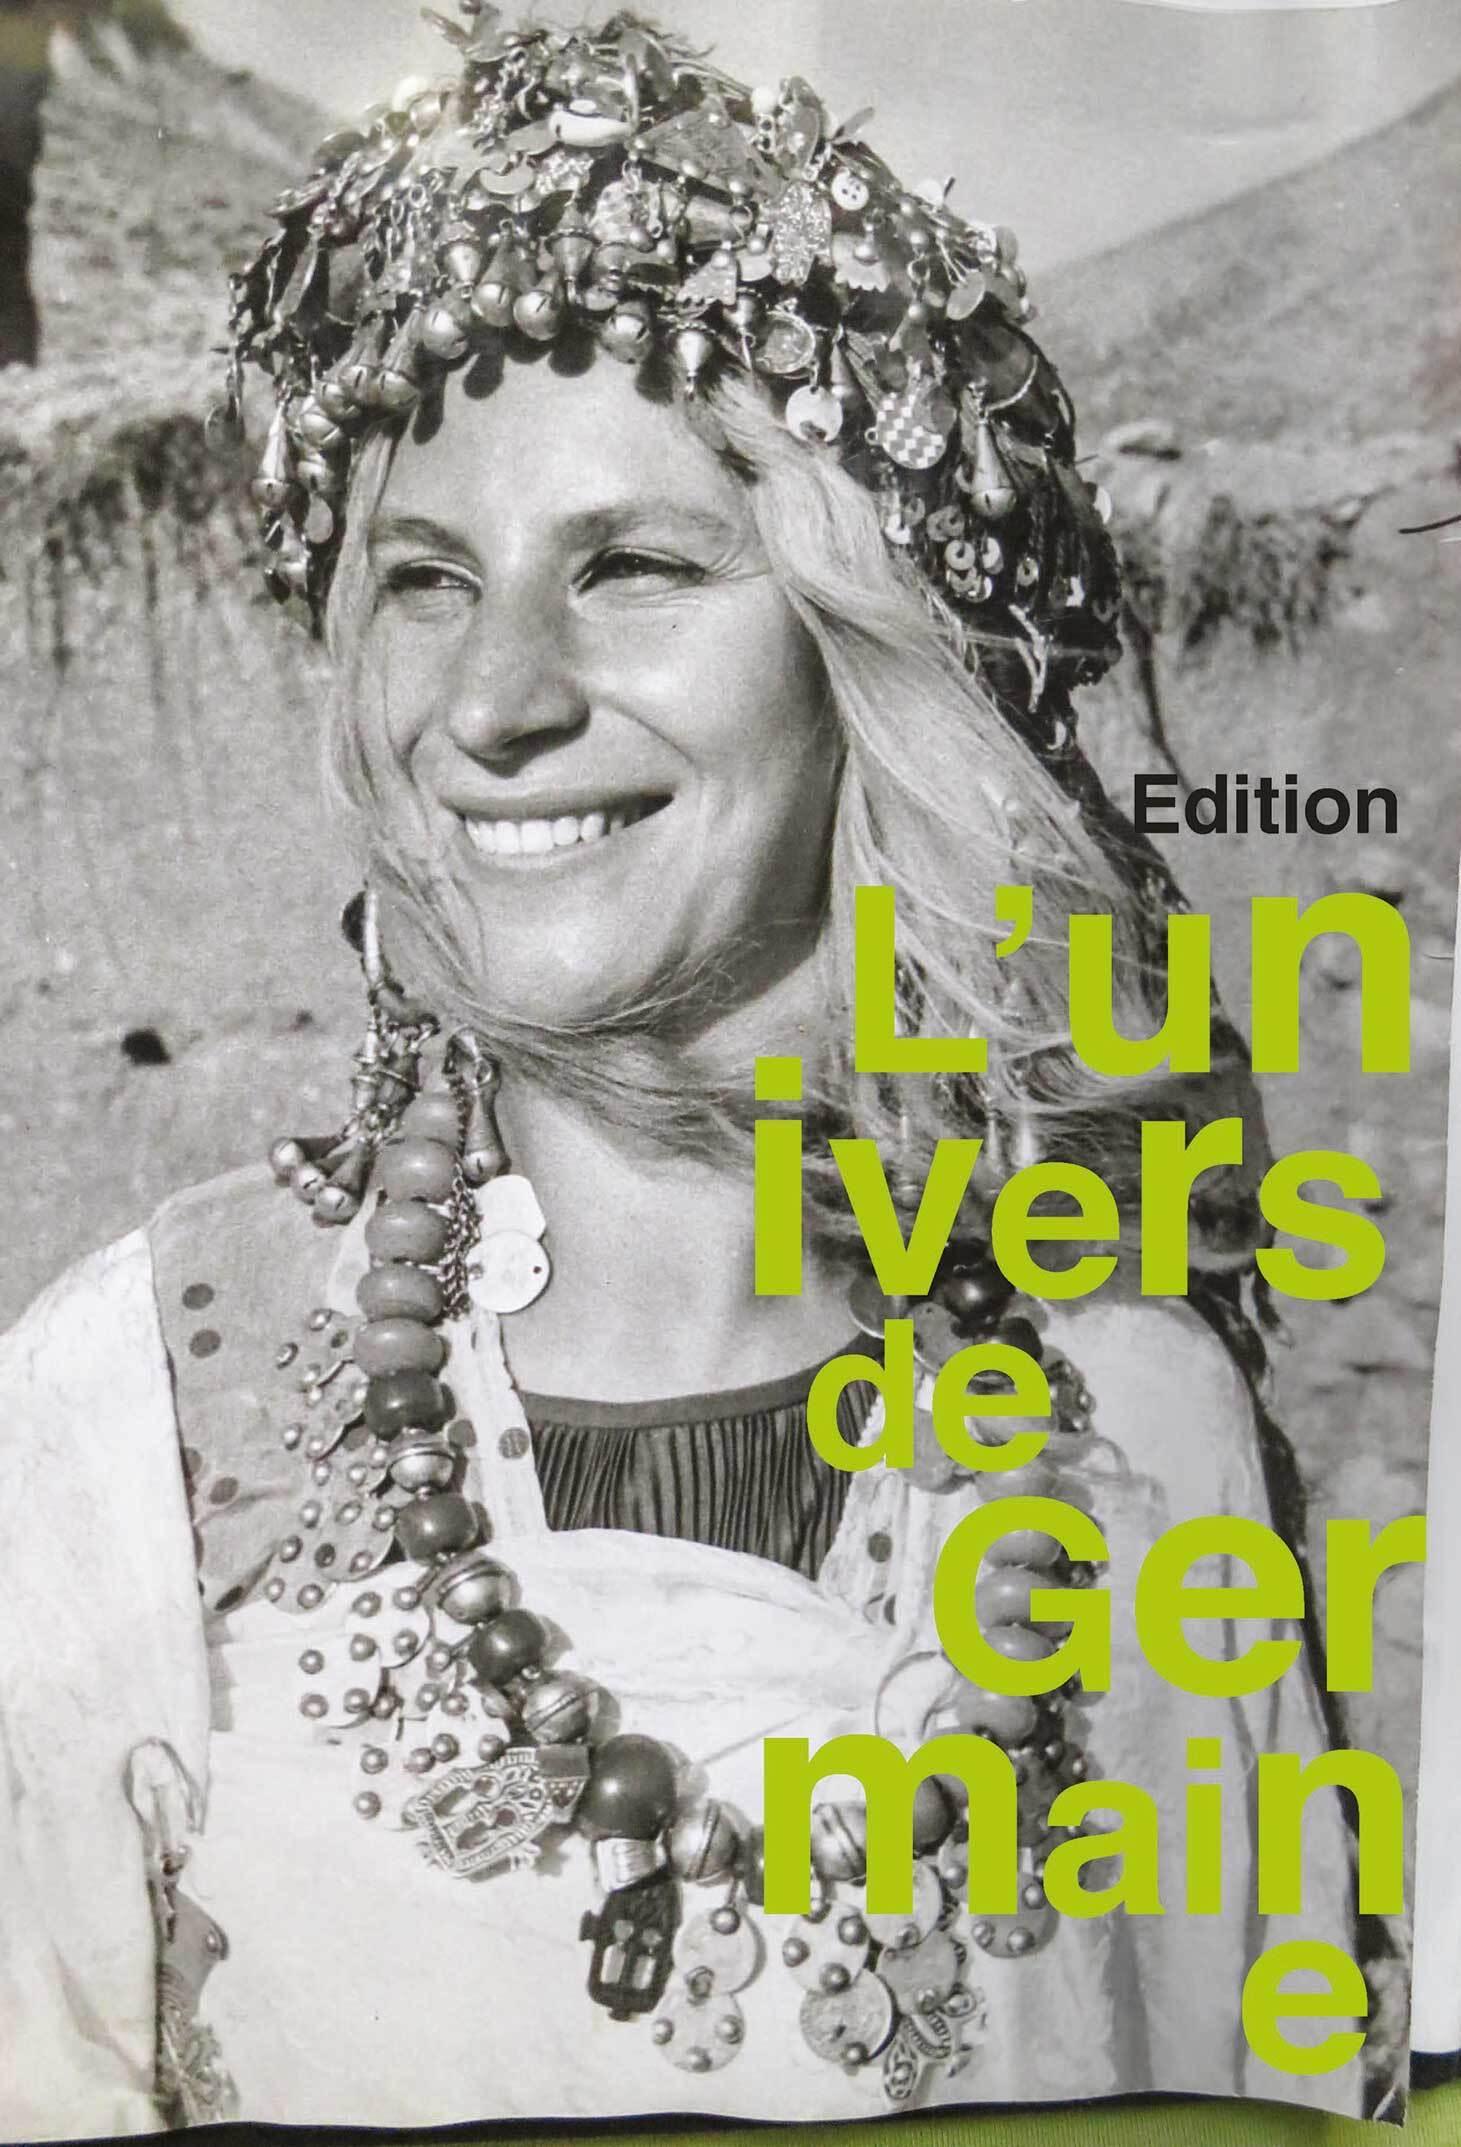 Edition Germain Flyer